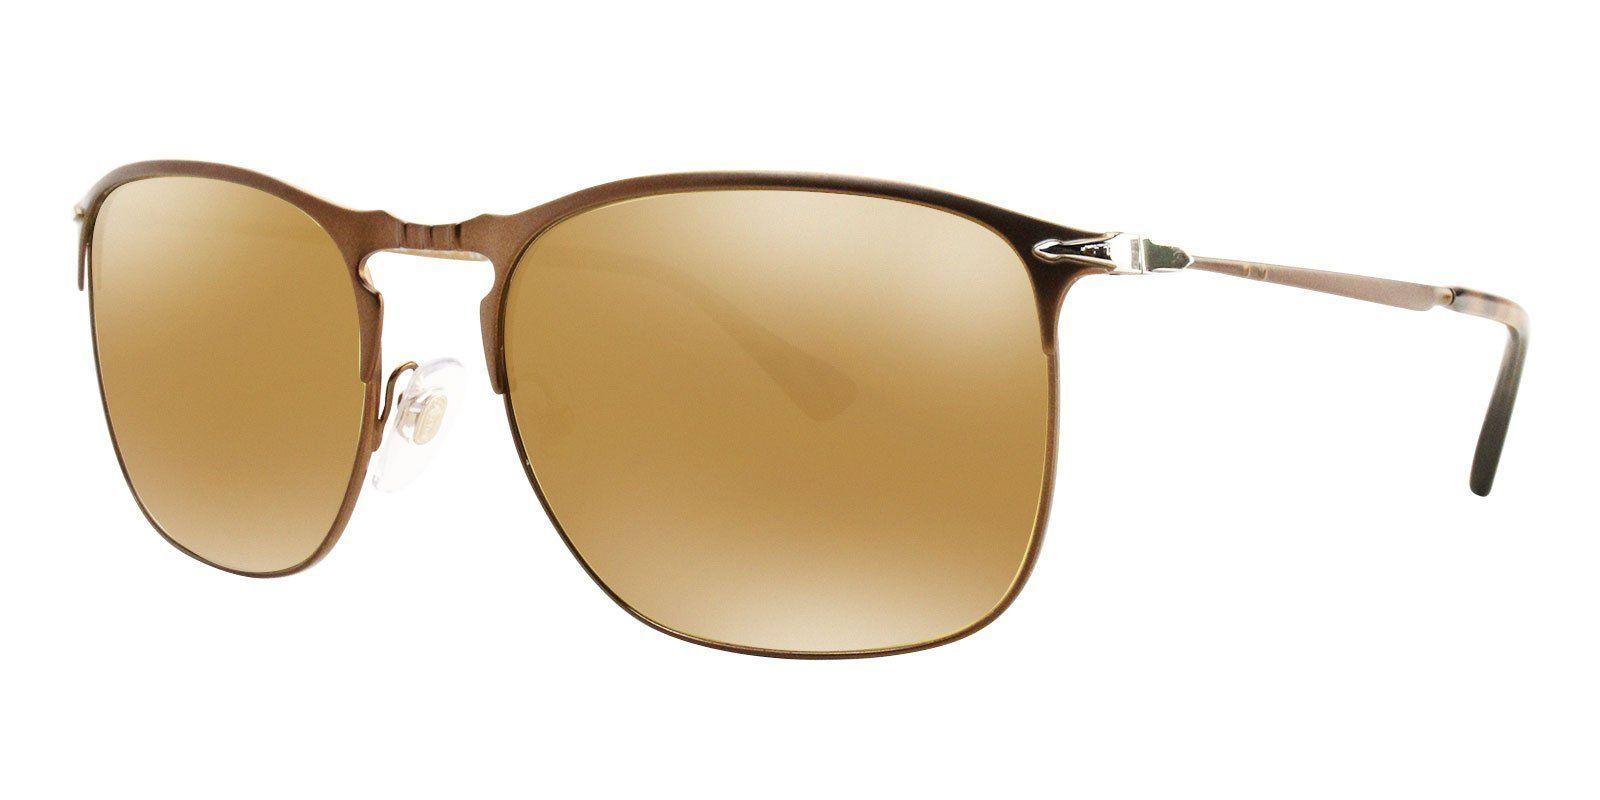 76e883a7eaffe Persol - PO7359S Bronze - Gold-sunglasses-Designer Eyes